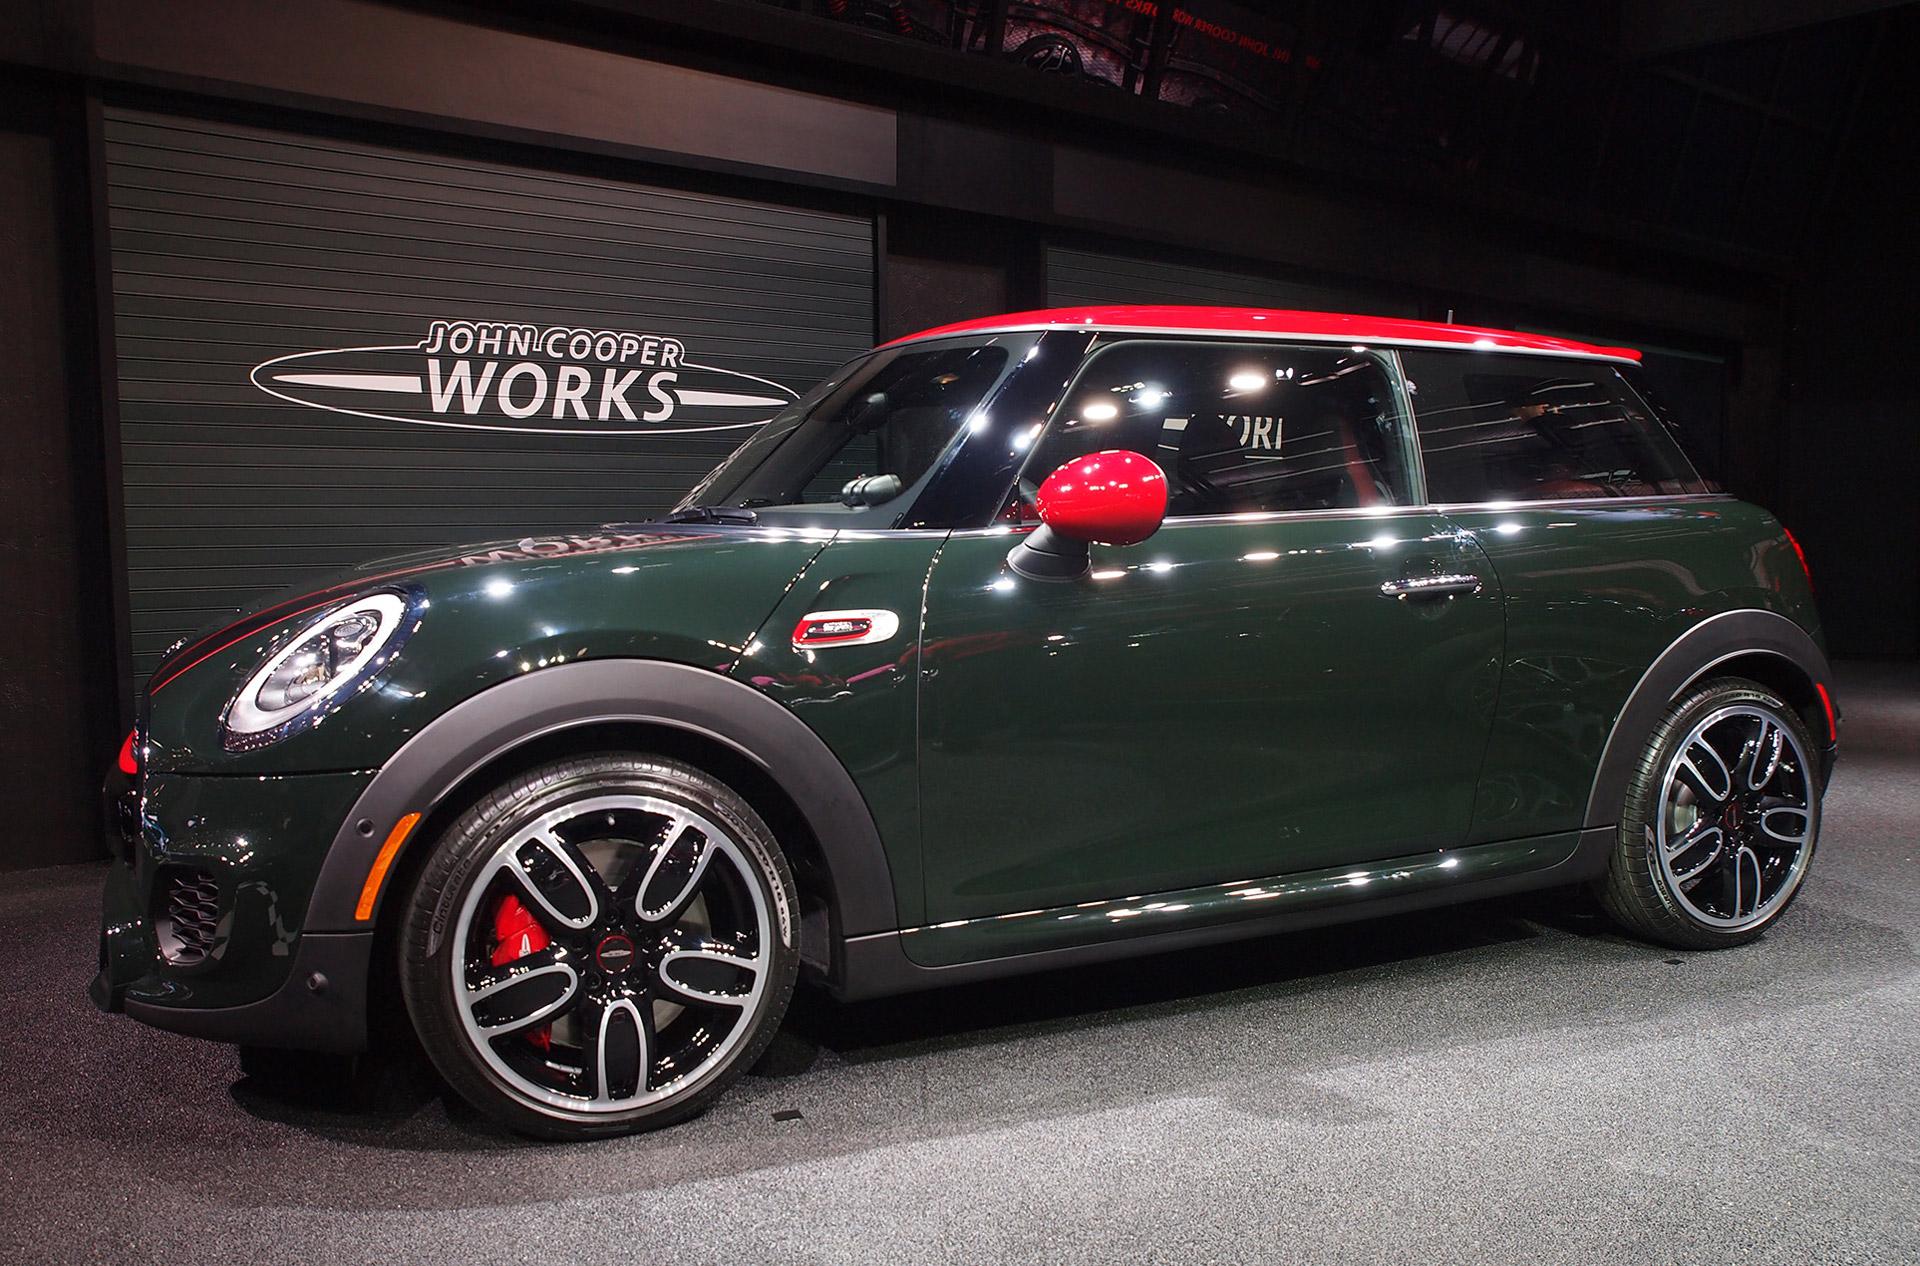 2015 MINI John Cooper Works Appears in Detroit -